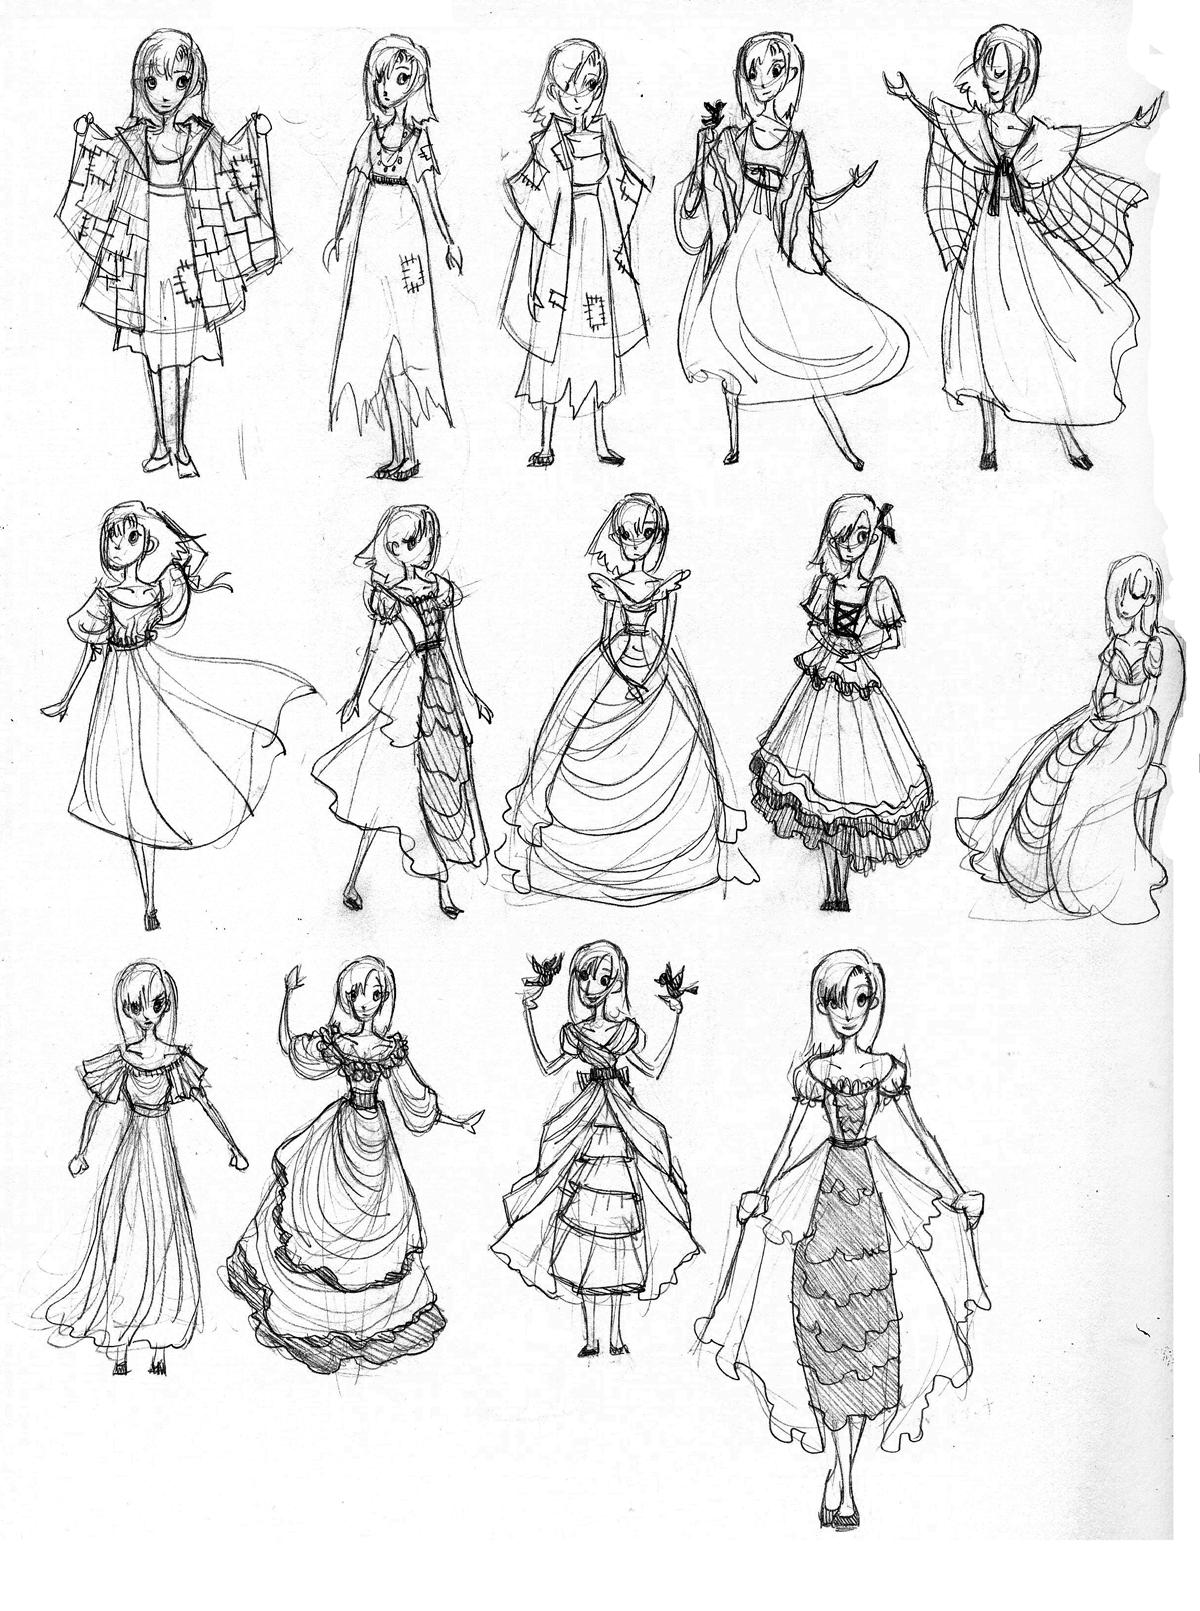 Princess Dress Designs Drawings, Princess drawings